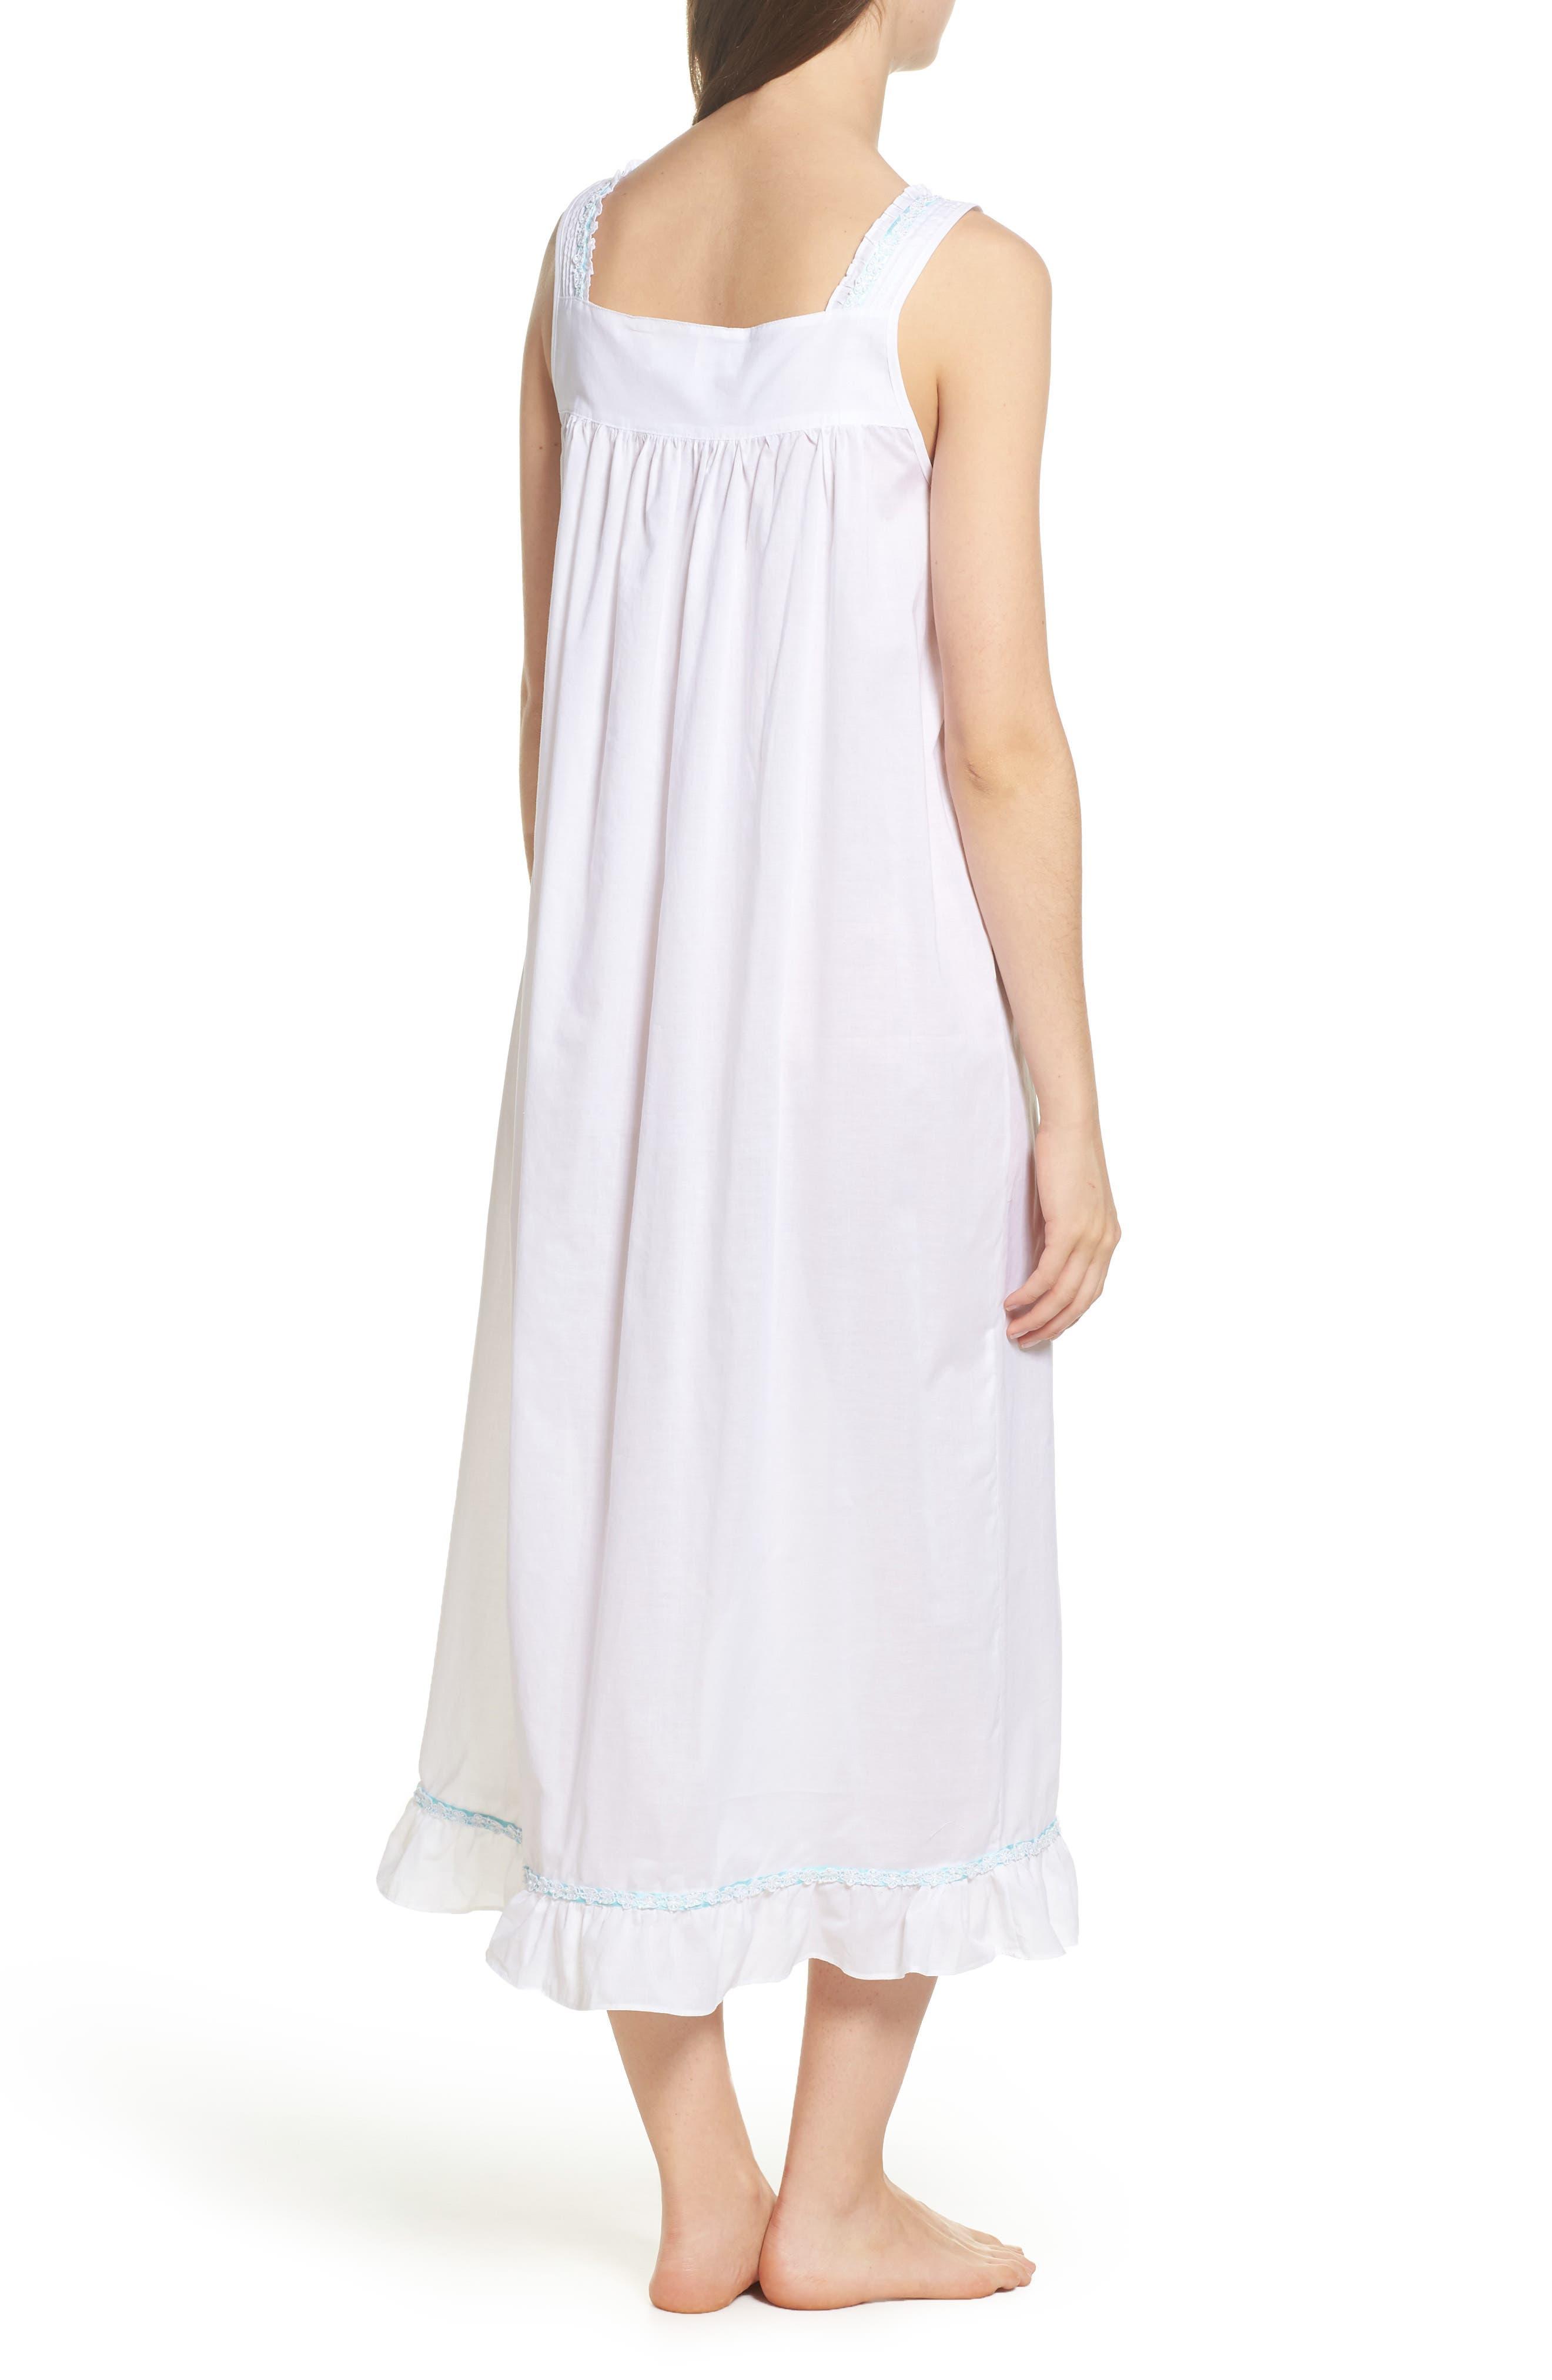 Cotton Lawn Ballet Nightgown,                             Alternate thumbnail 2, color,                             100